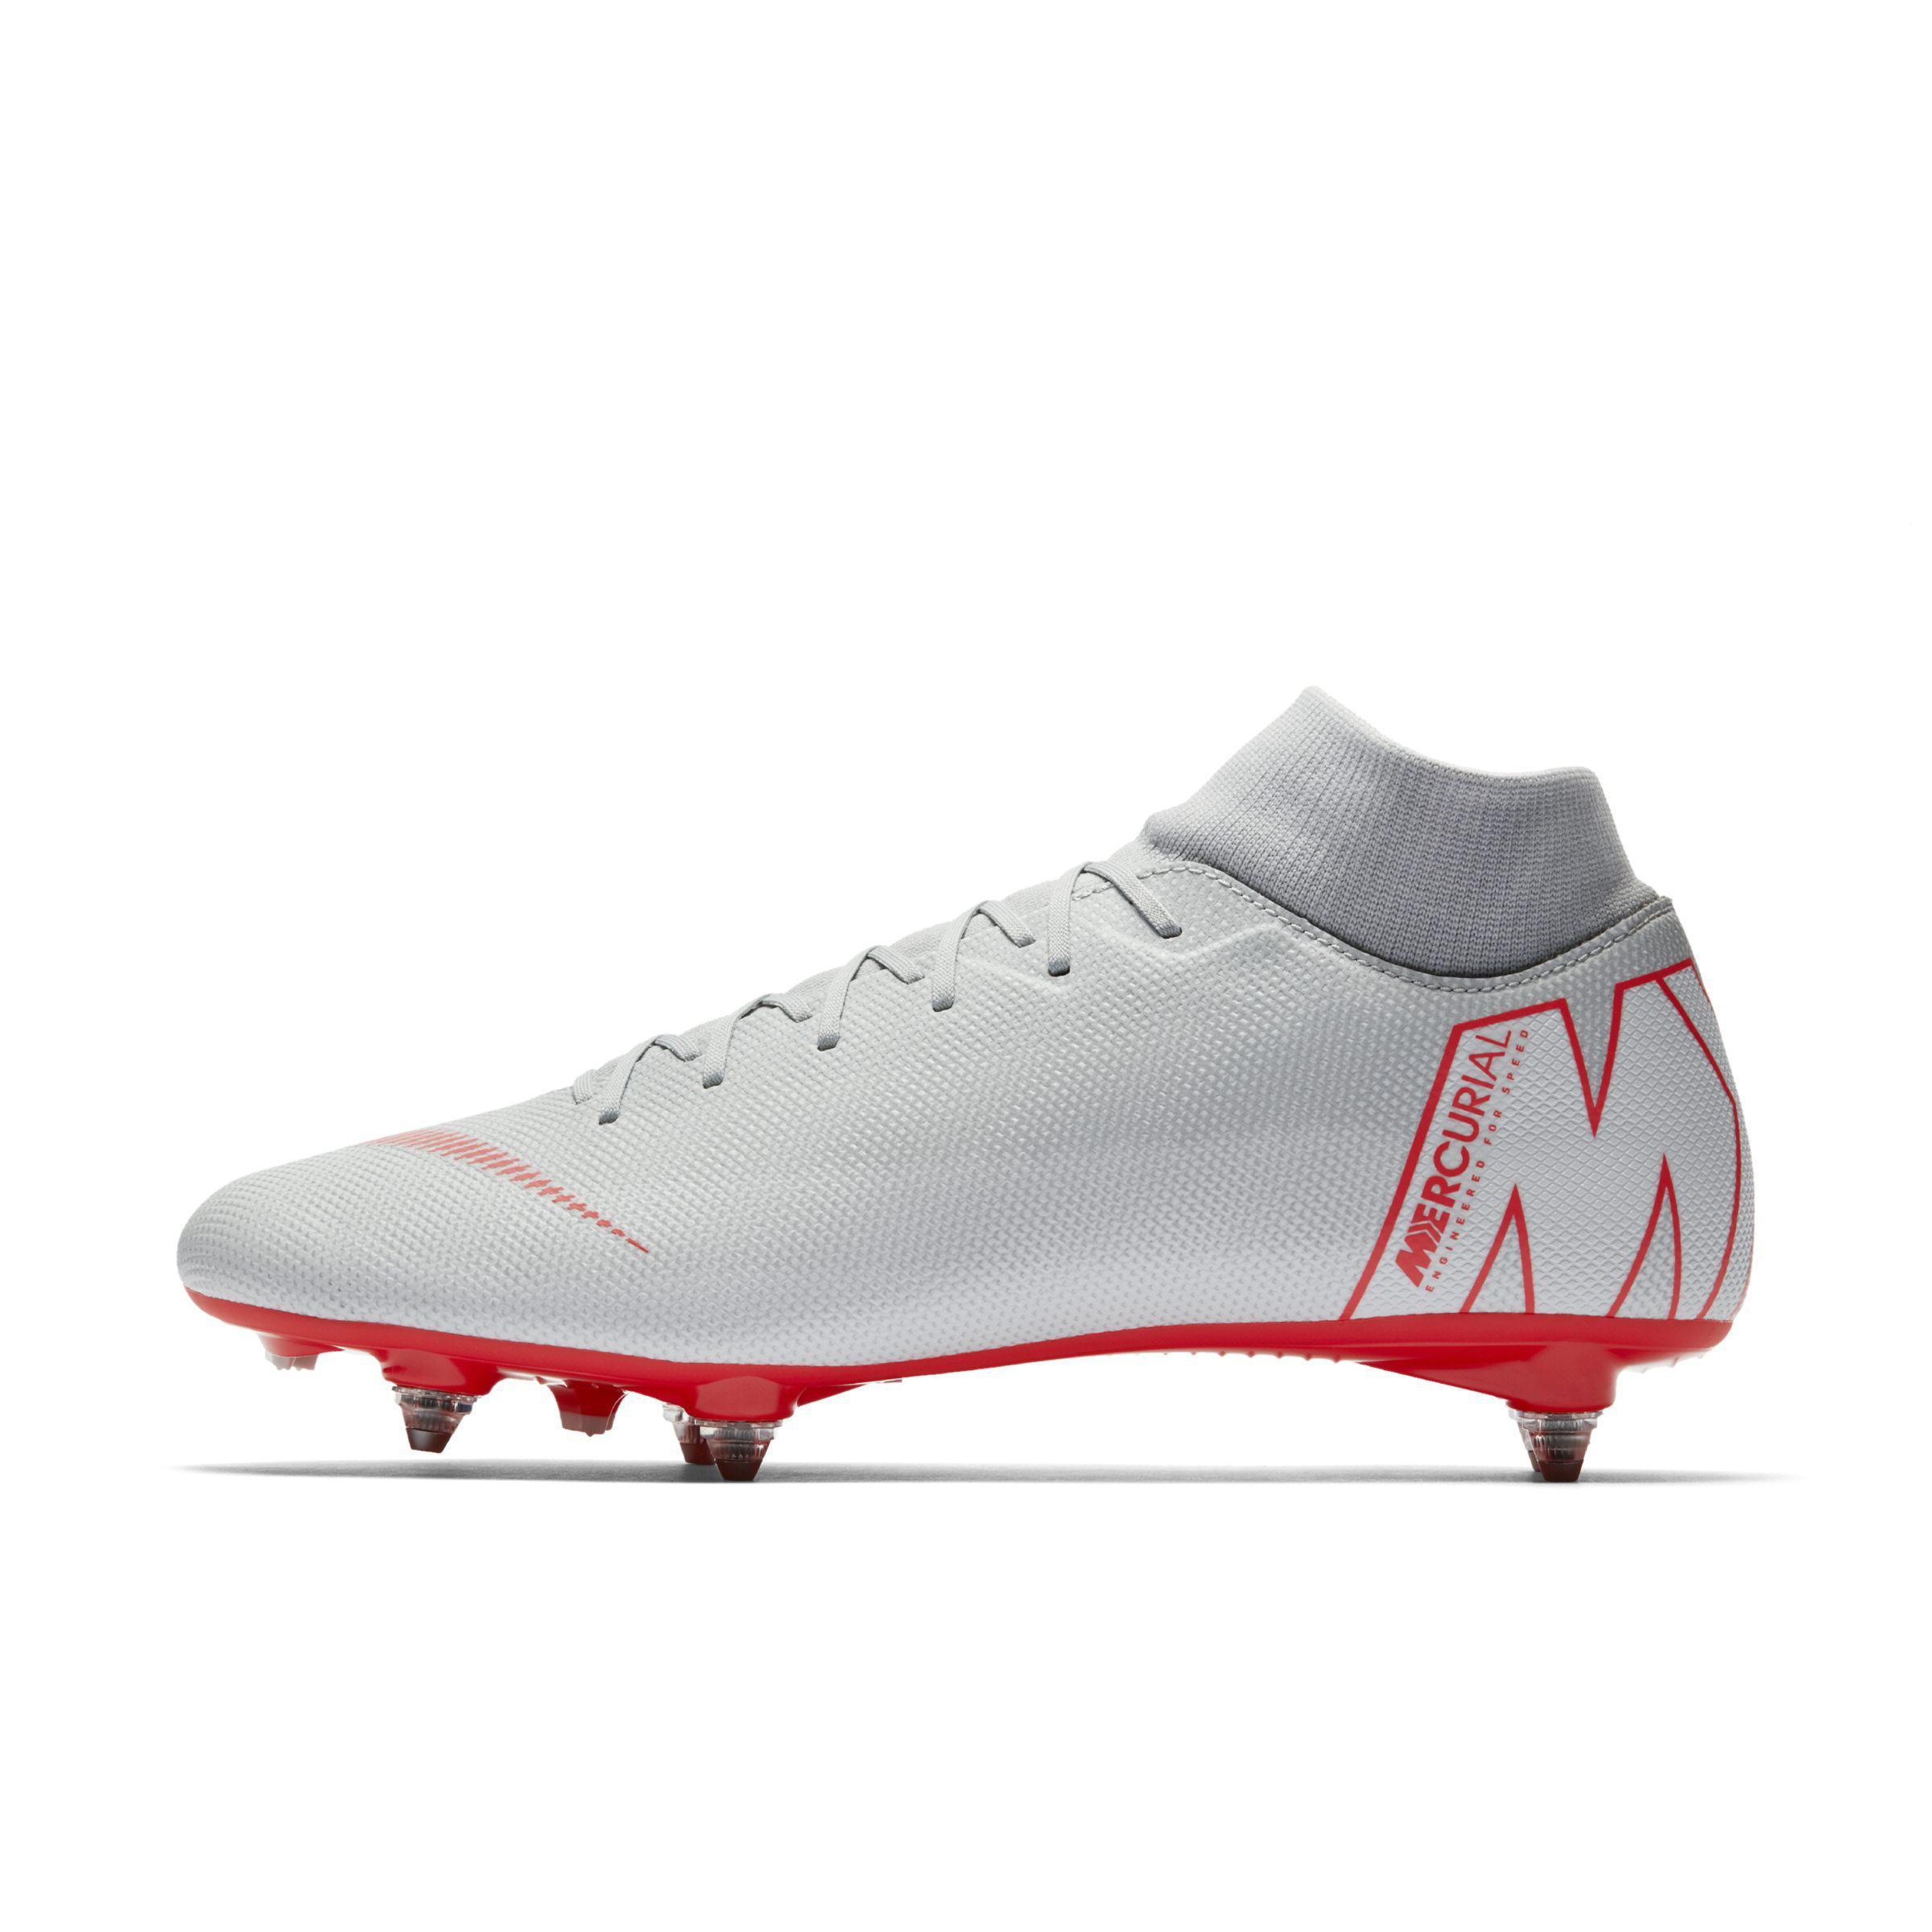 Nike Mercurial Superfly Vi Academy Sg-pro Soft-ground Football Boot ... d8d138046b3